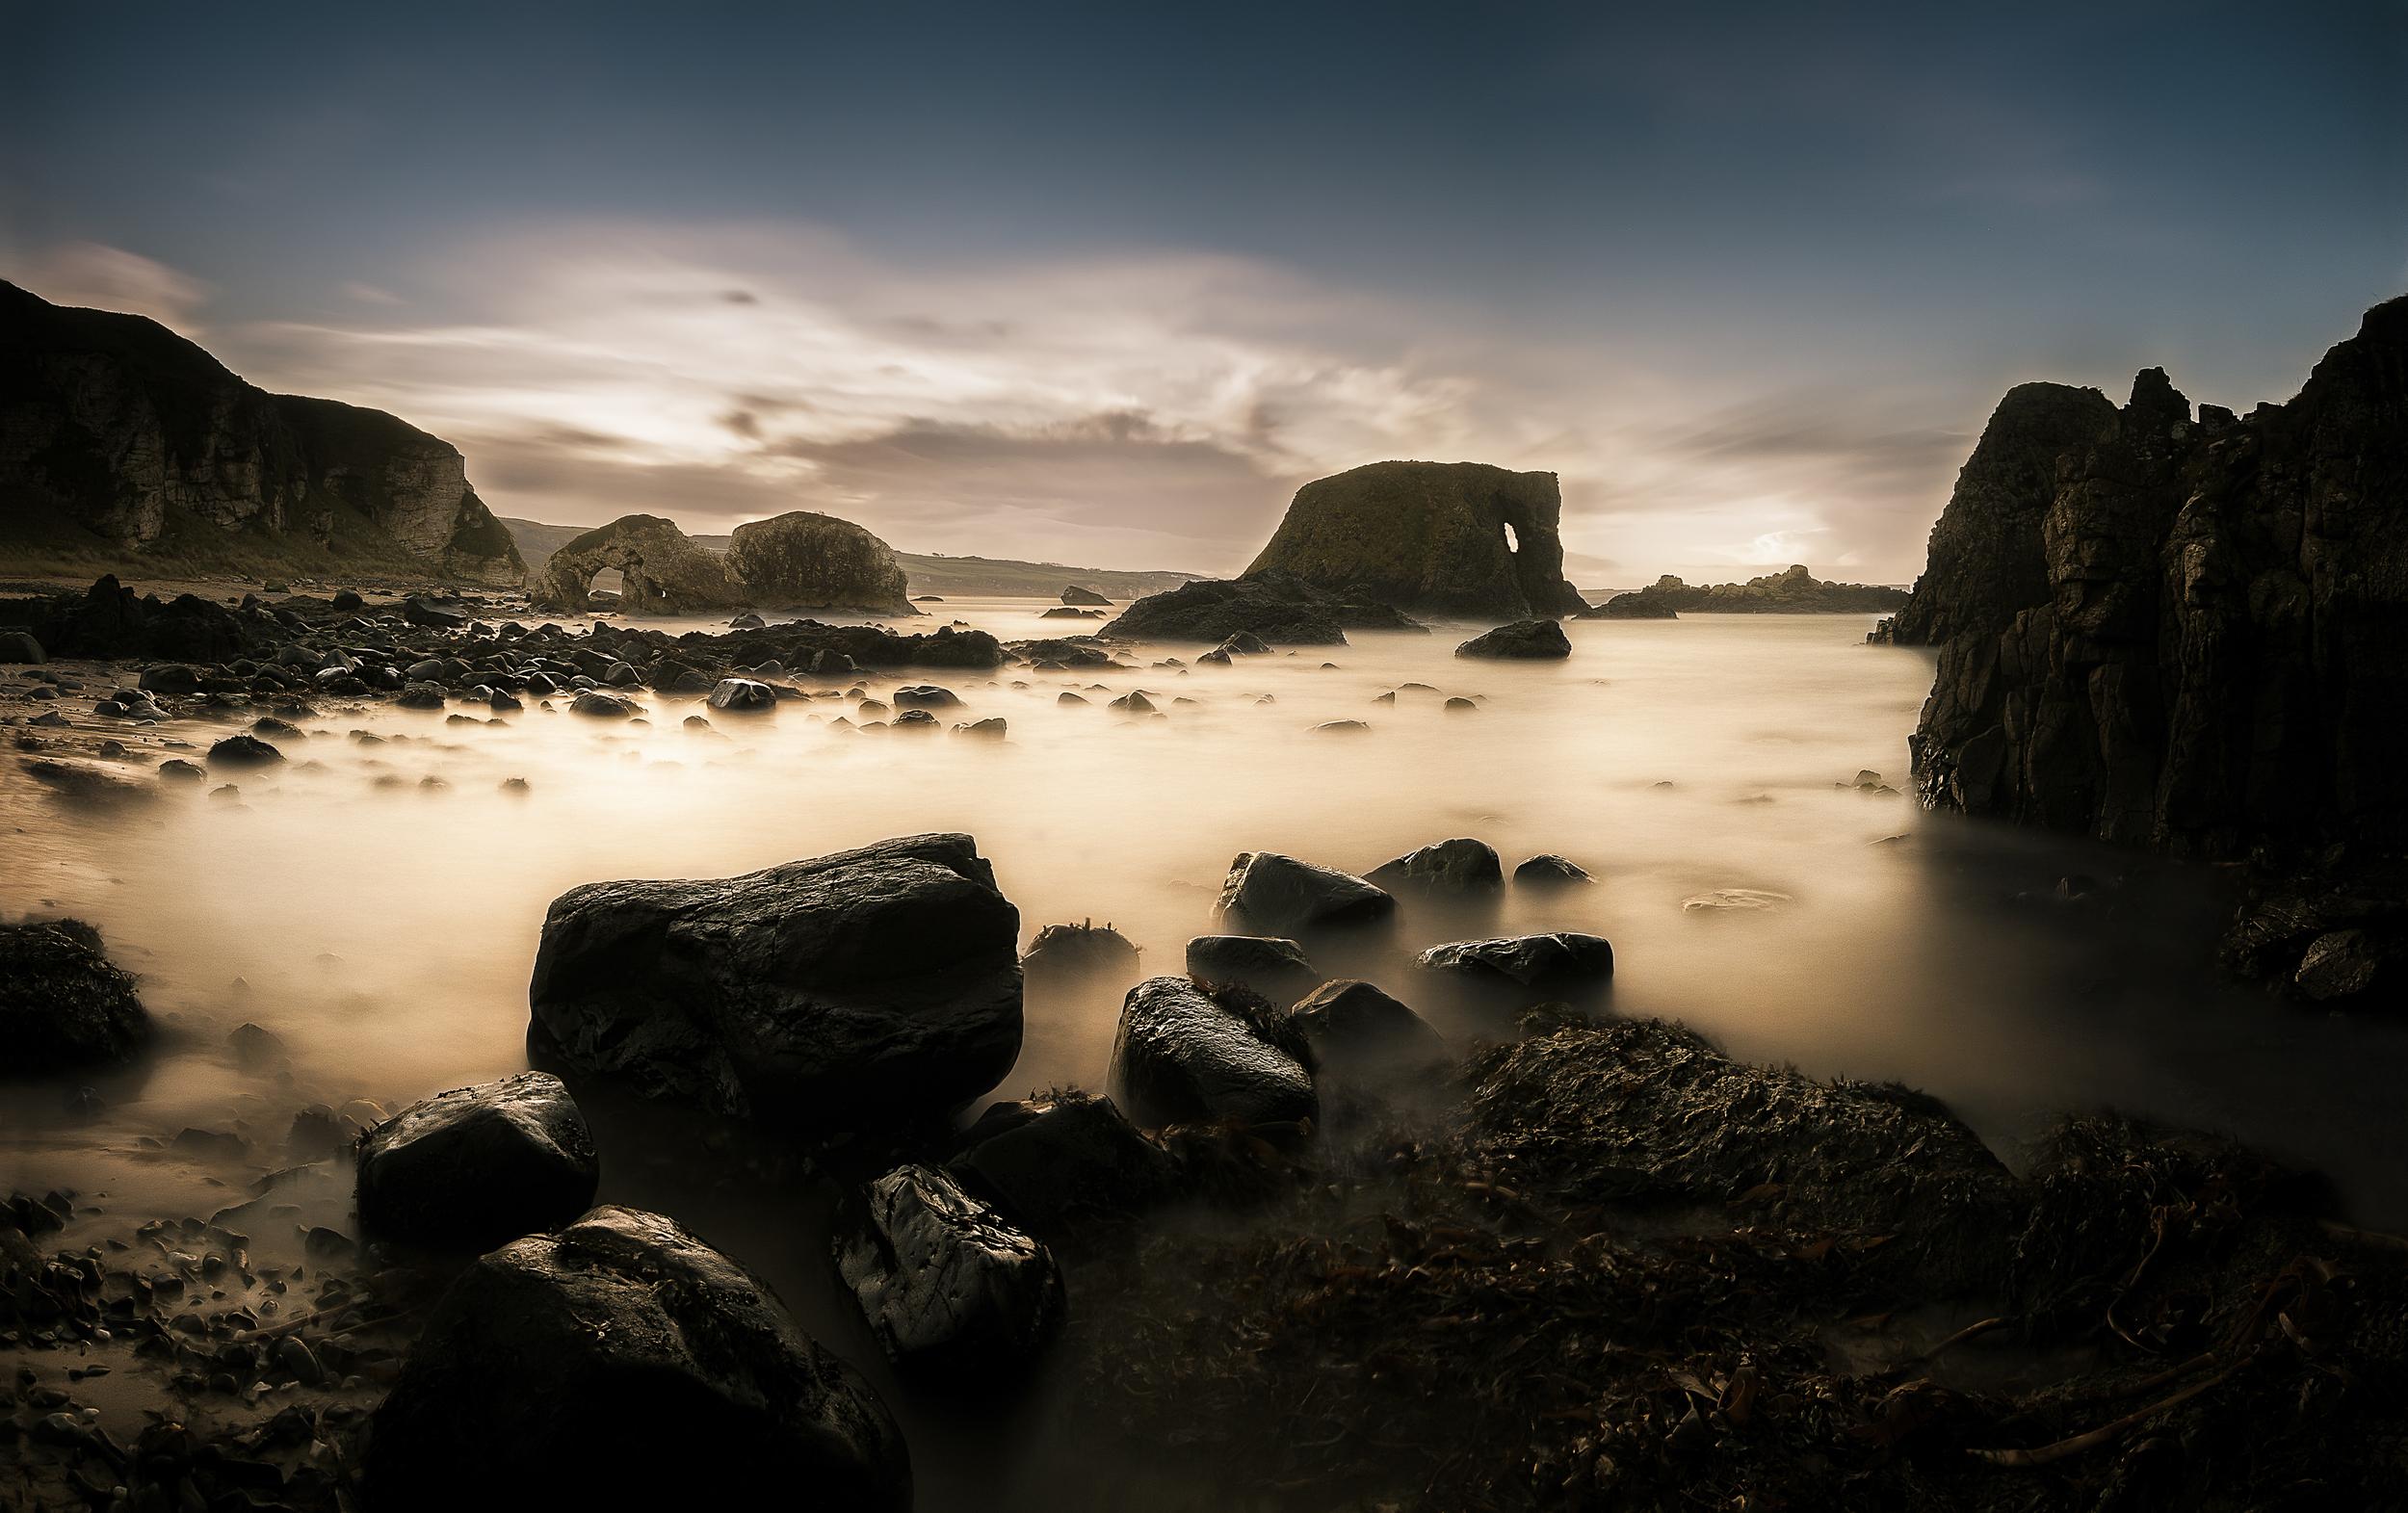 elephant rock,ballintoy,northern ireland.jpg